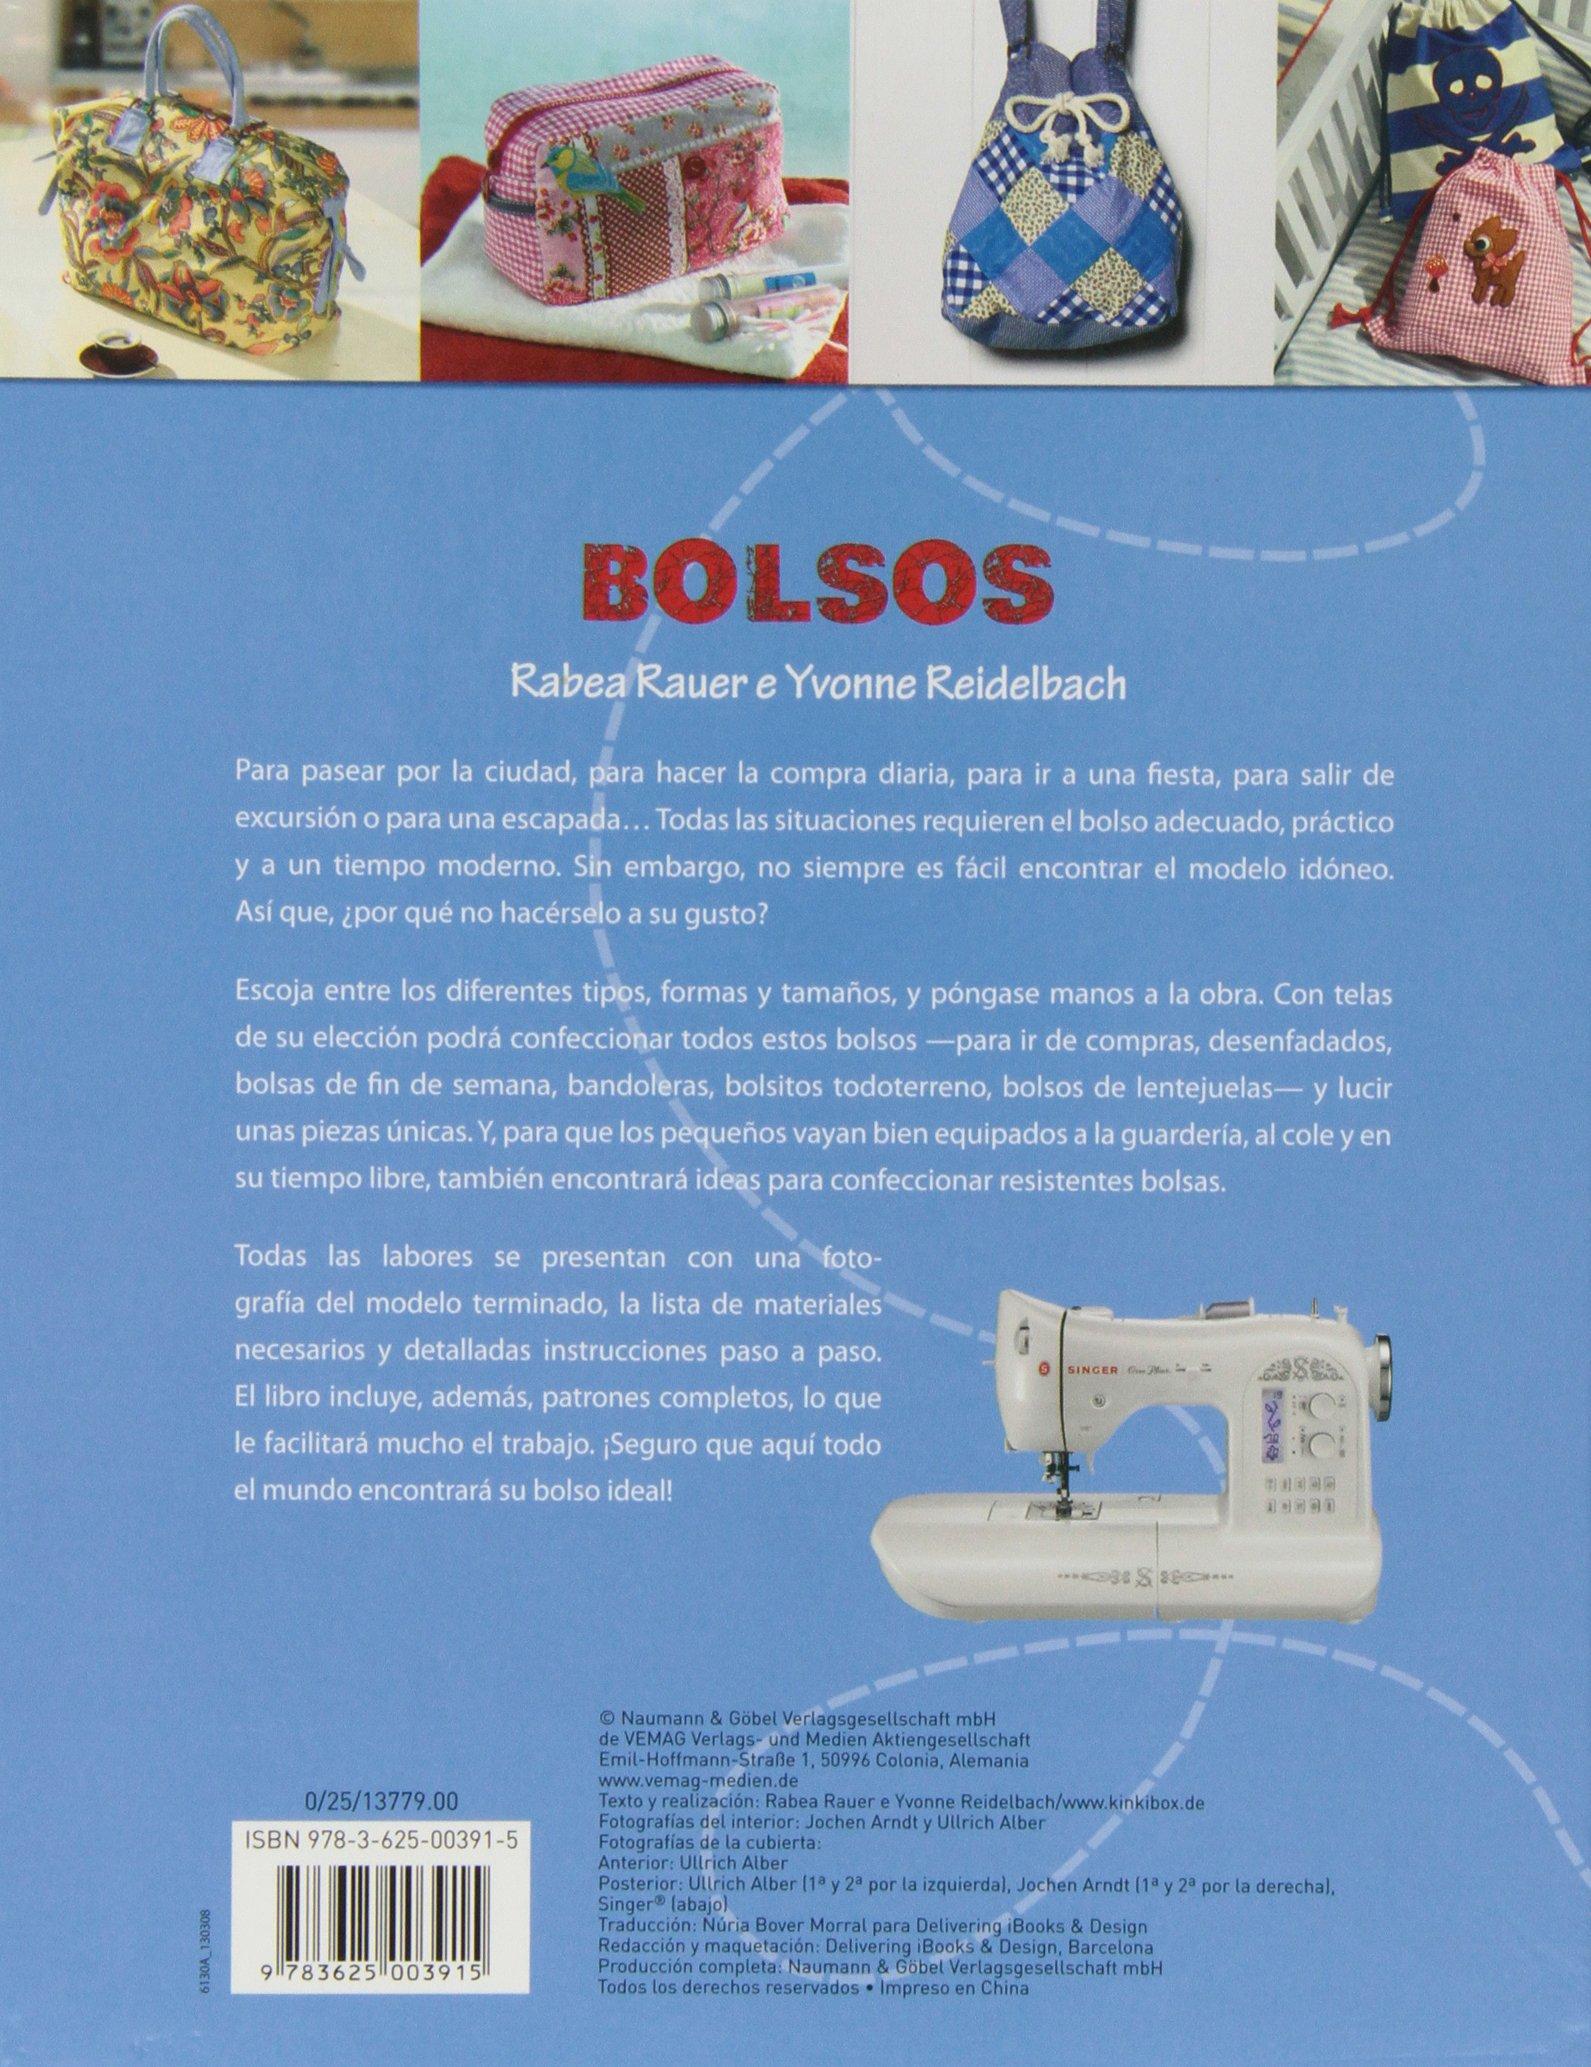 bolsos: BAKER: 9783625003915: Amazon.com: Books